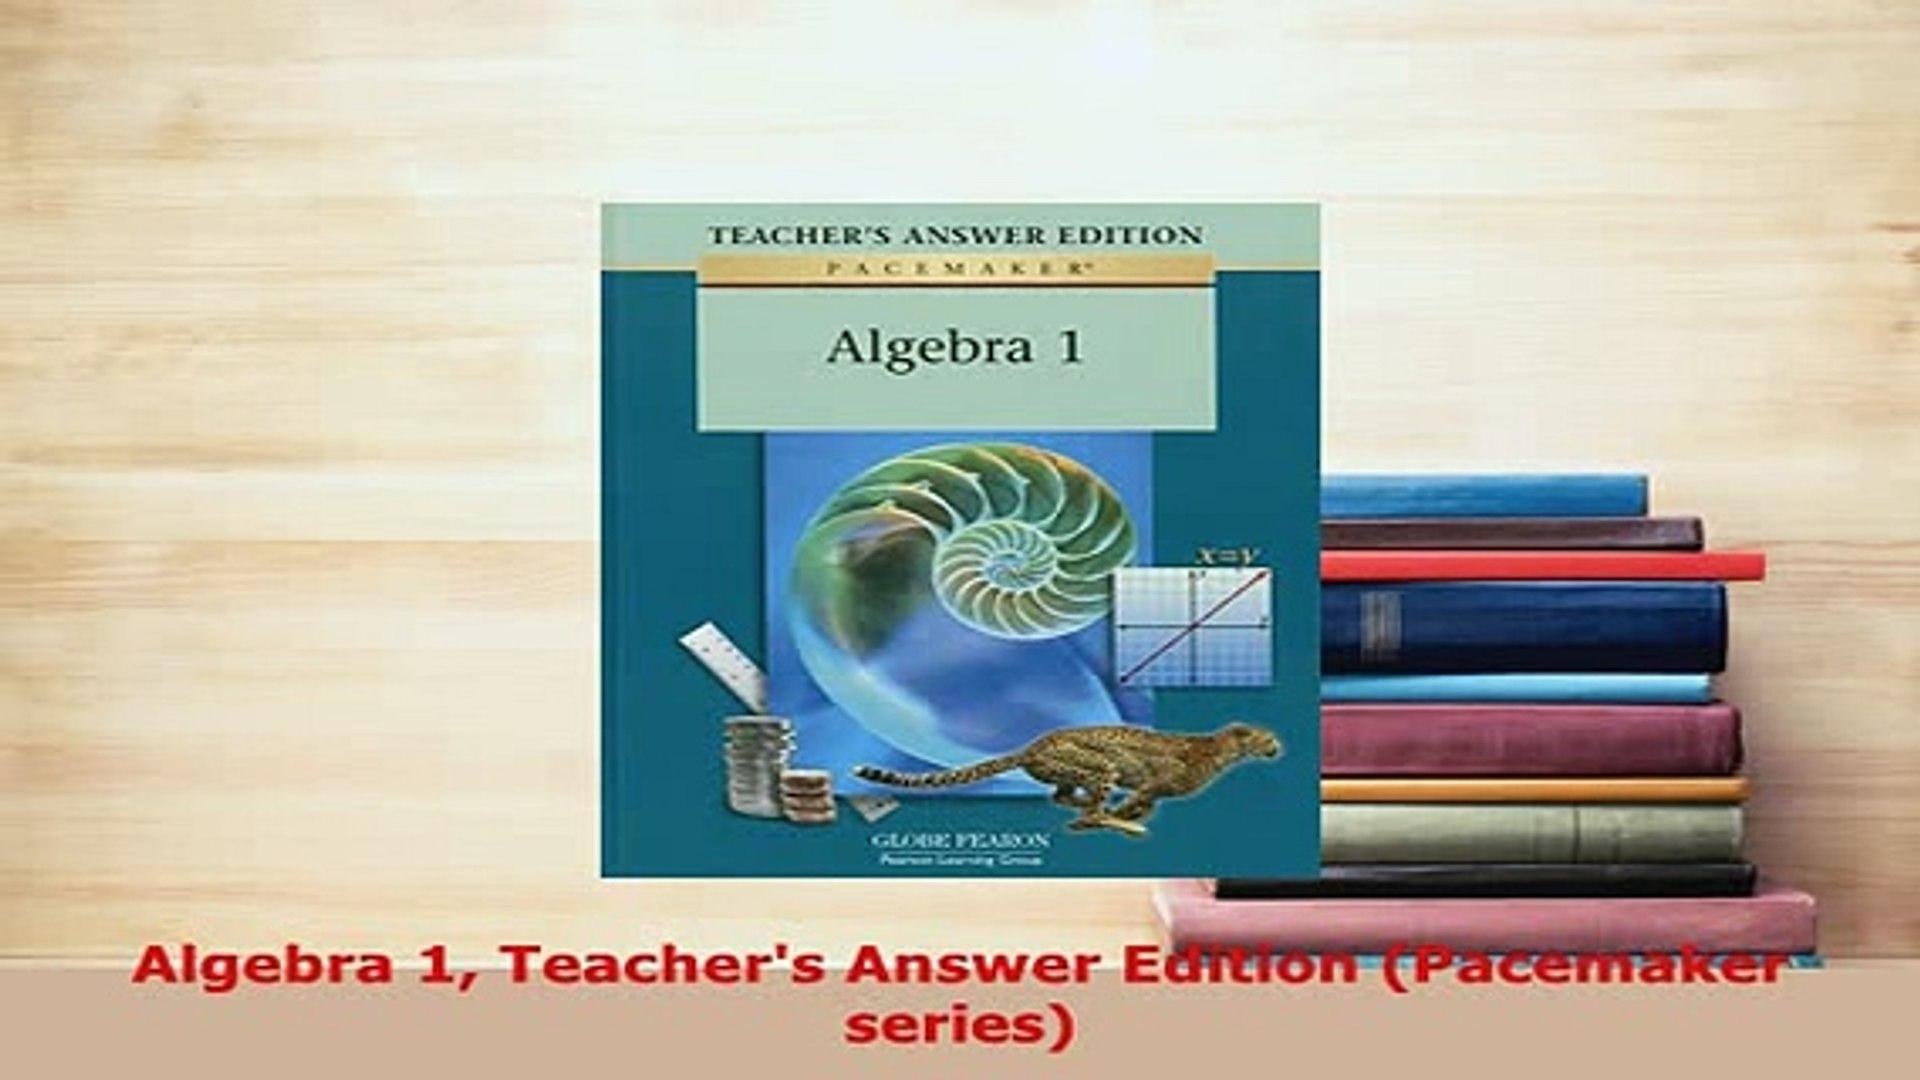 PDF Algebra 1 Teachers Answer Edition Pacemaker series Read Full Ebook